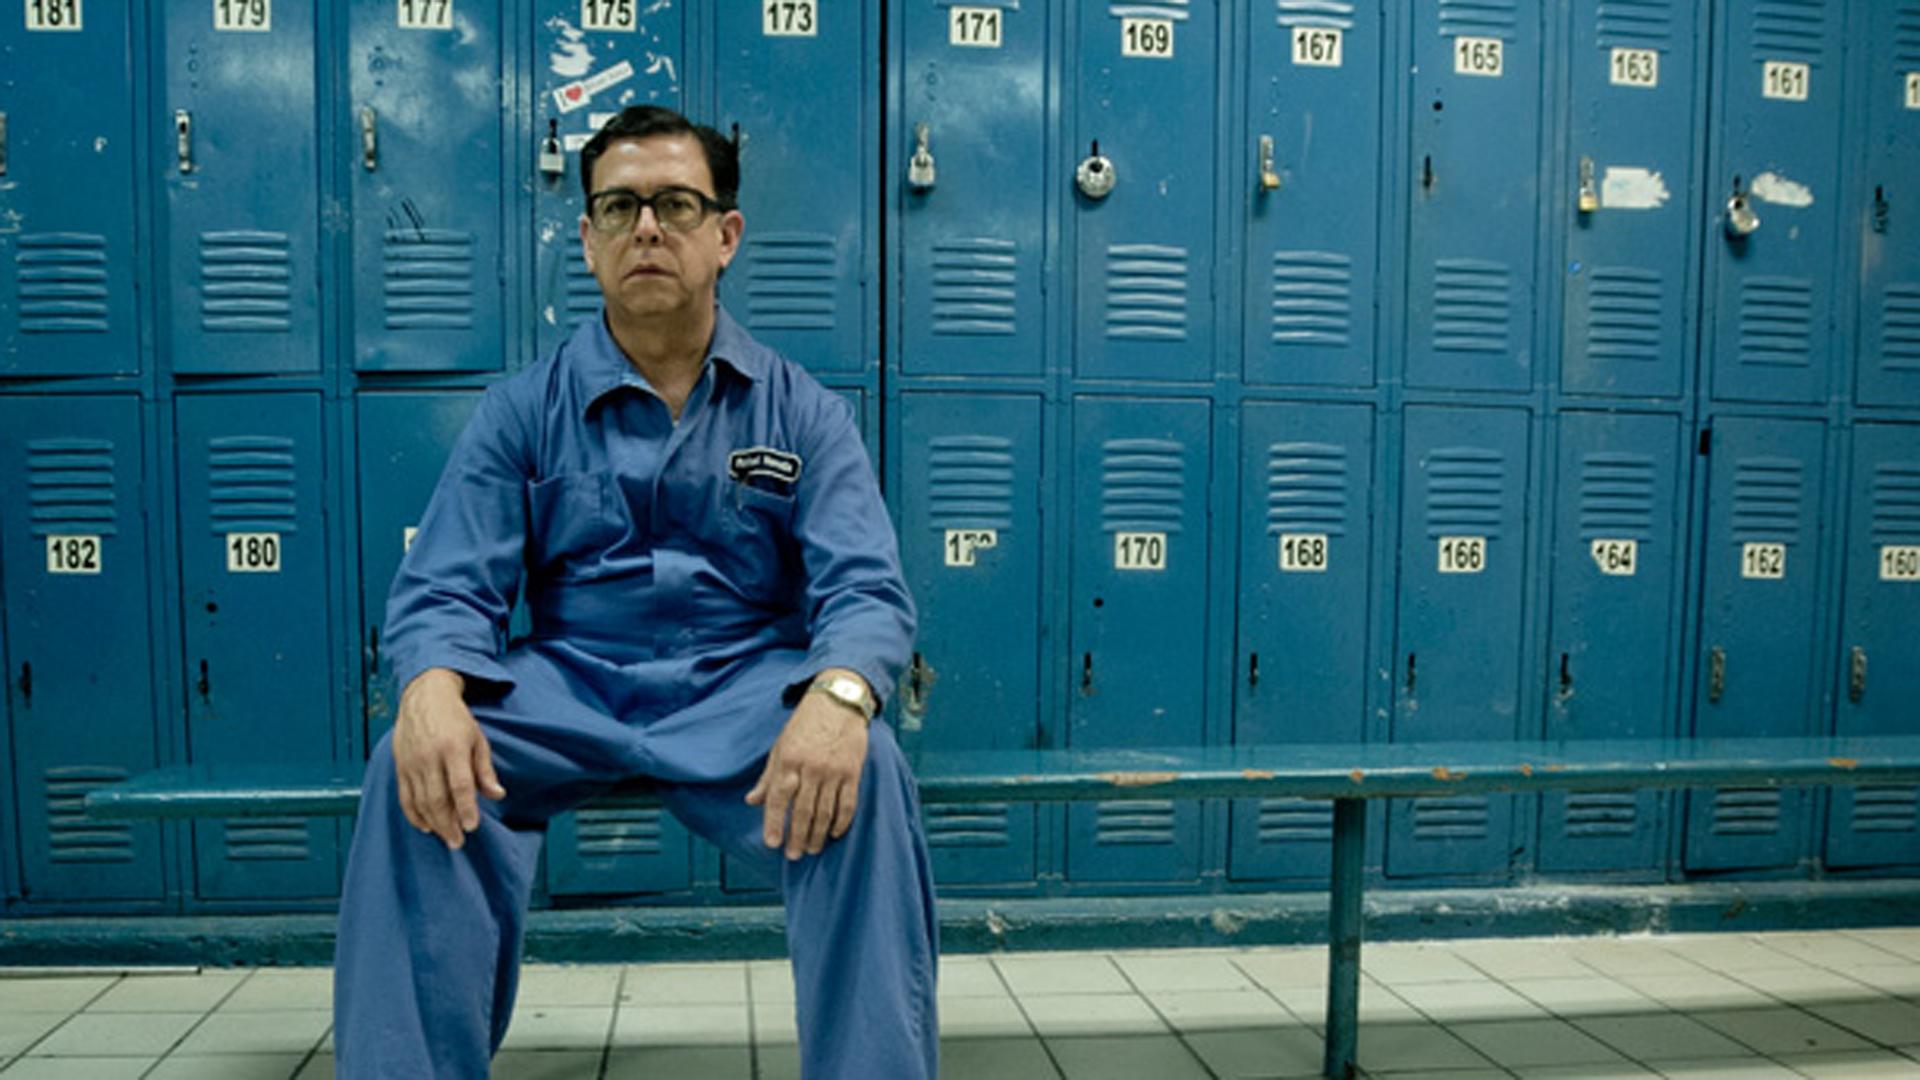 El Cuarto Desnudo (2013) - IMDb